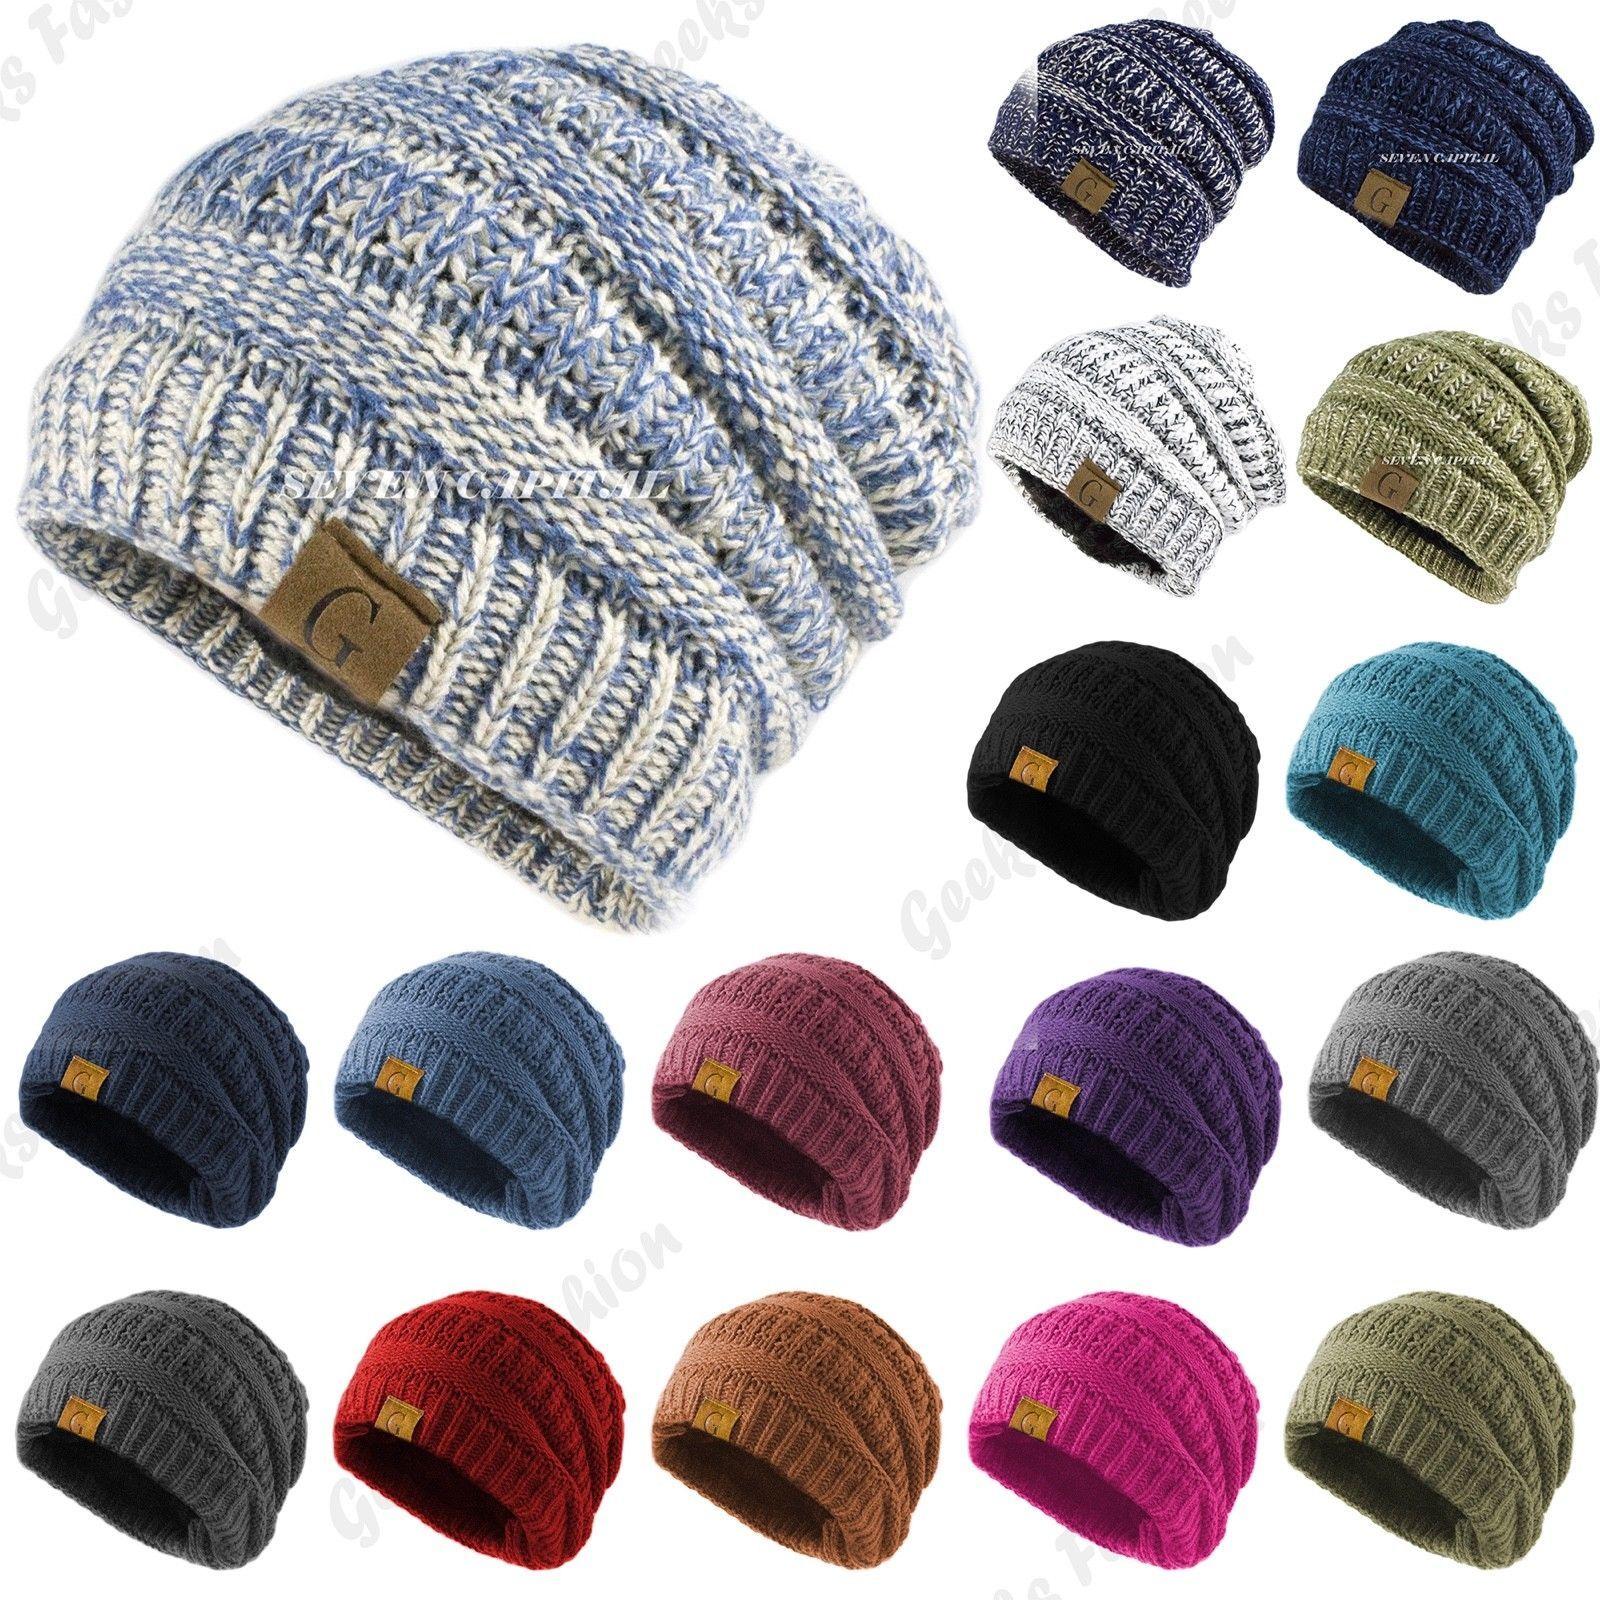 Black Color Beanie Knit  Men Women Winter Ski Warm Cap Skull Cuff Hats slouchy!